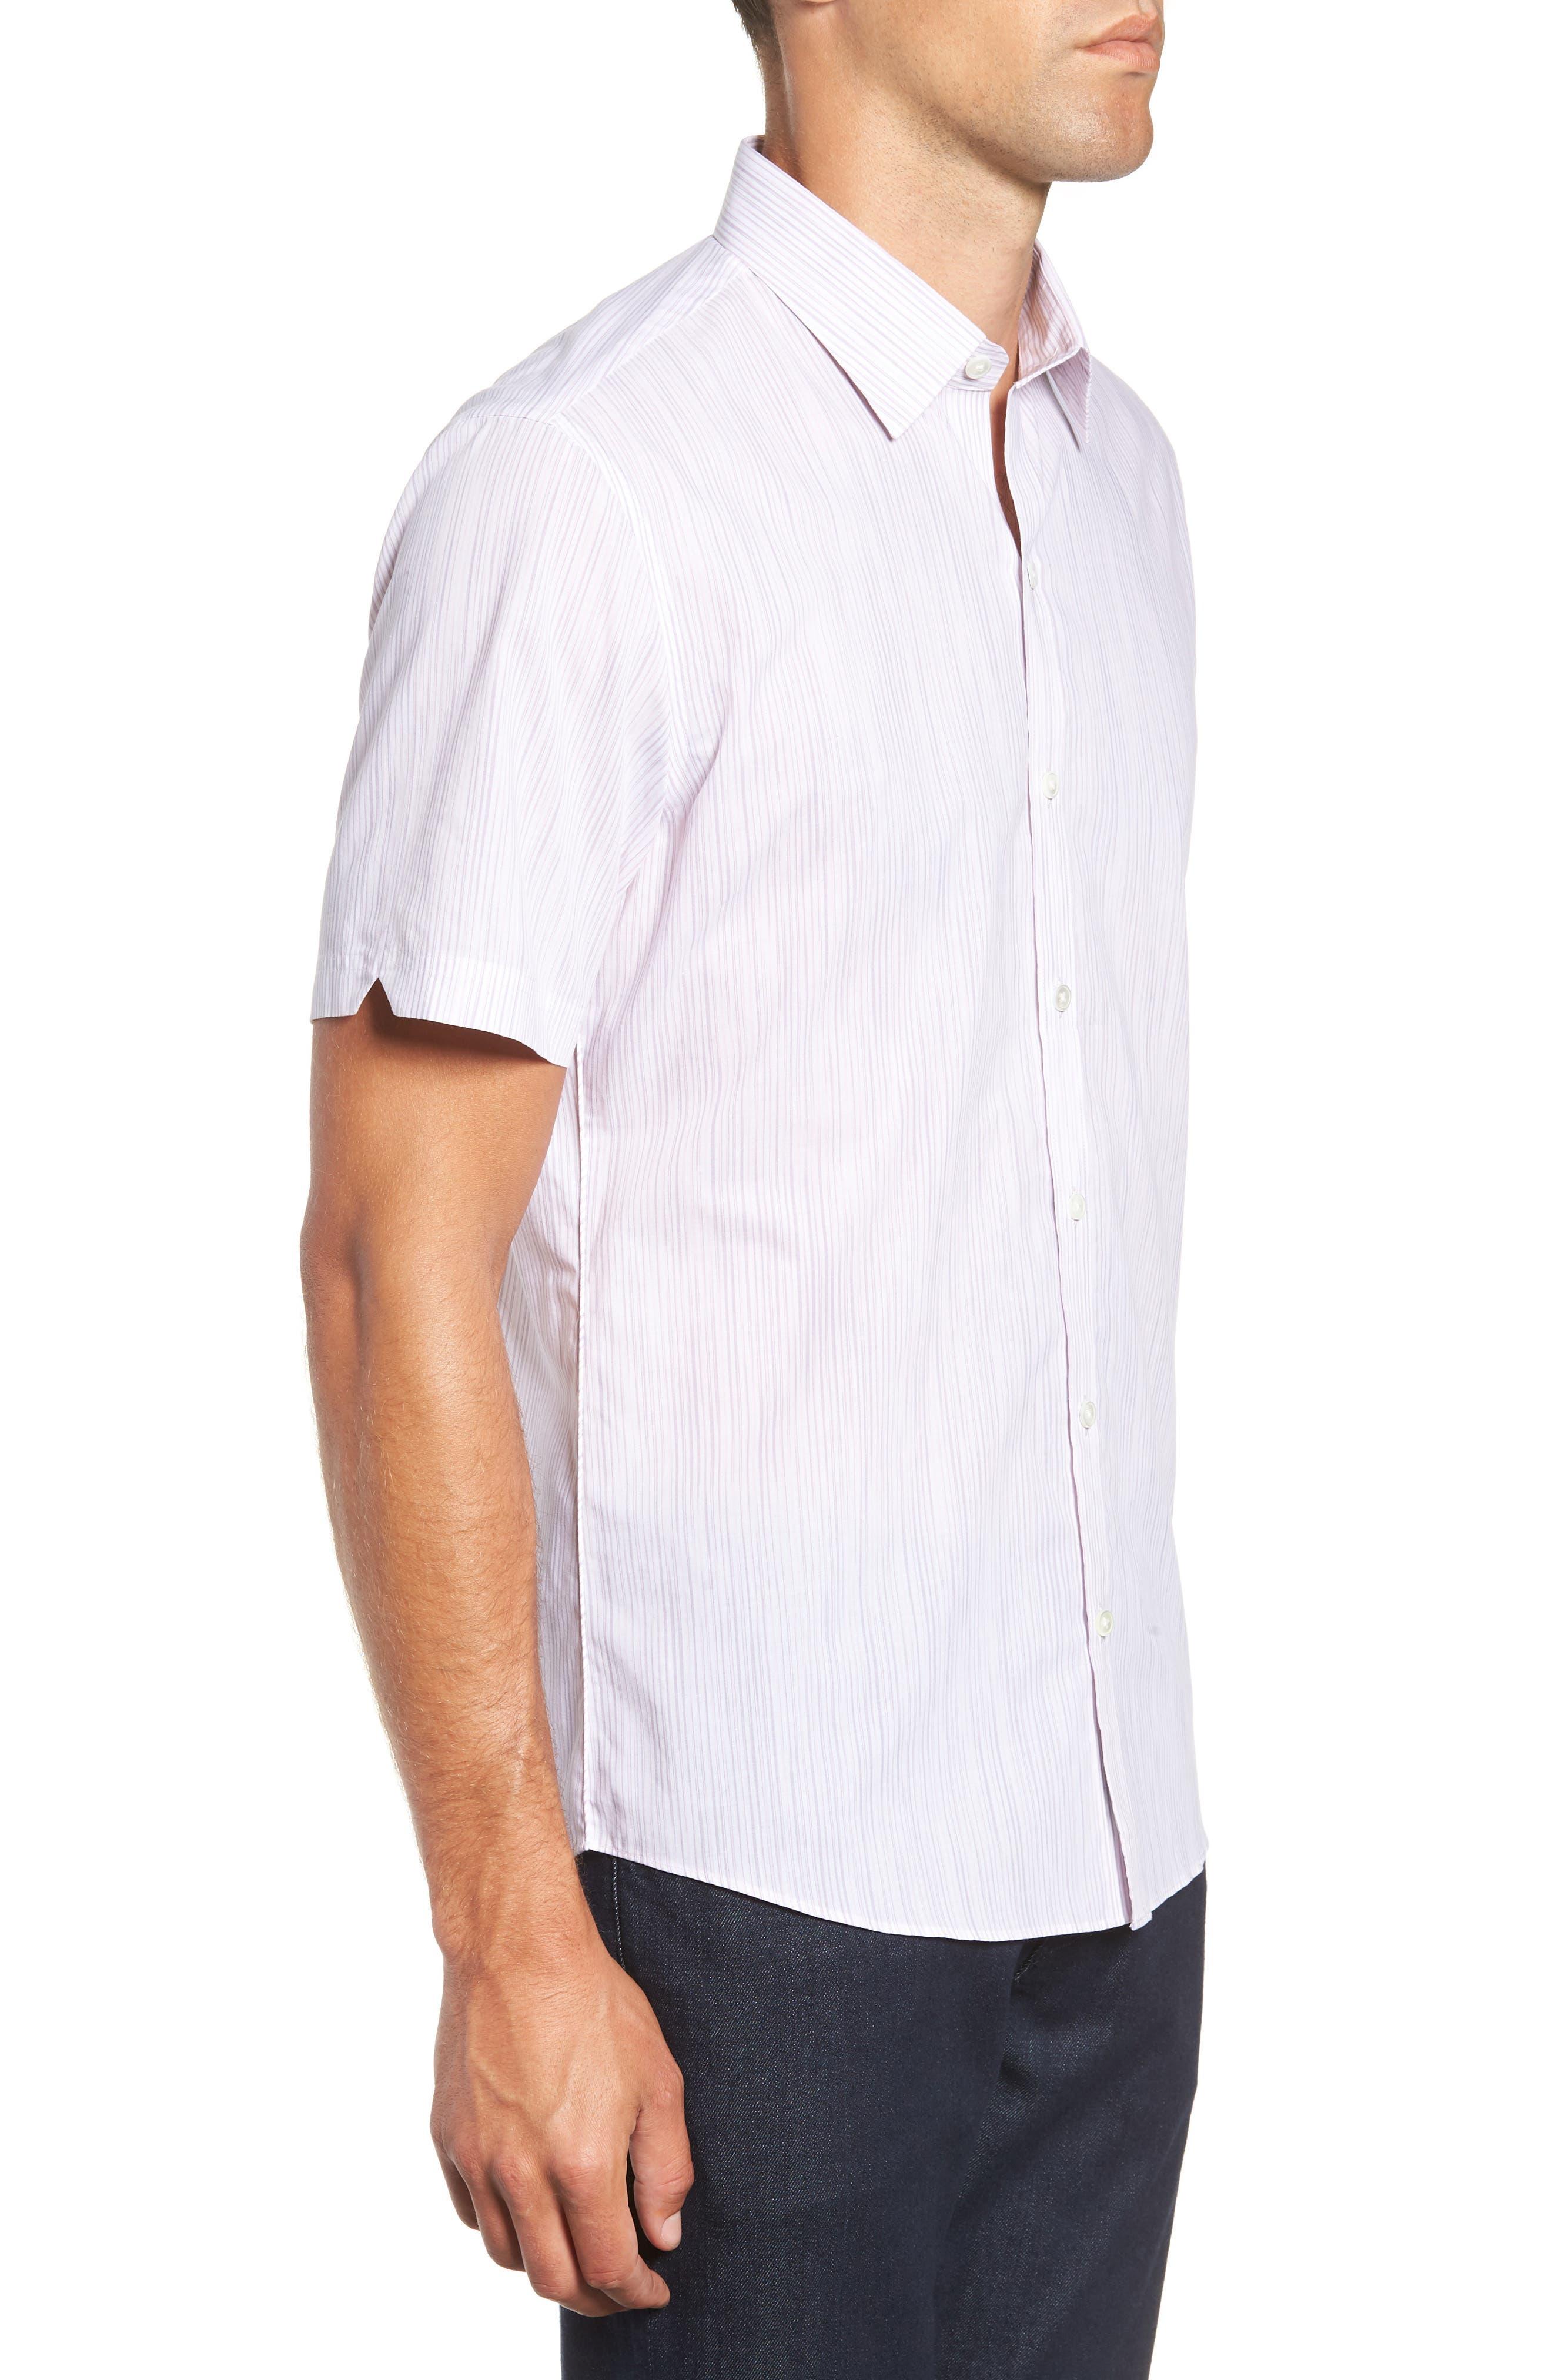 Bella Regular Fit Sport Shirt,                             Alternate thumbnail 4, color,                             LIGHT PINK